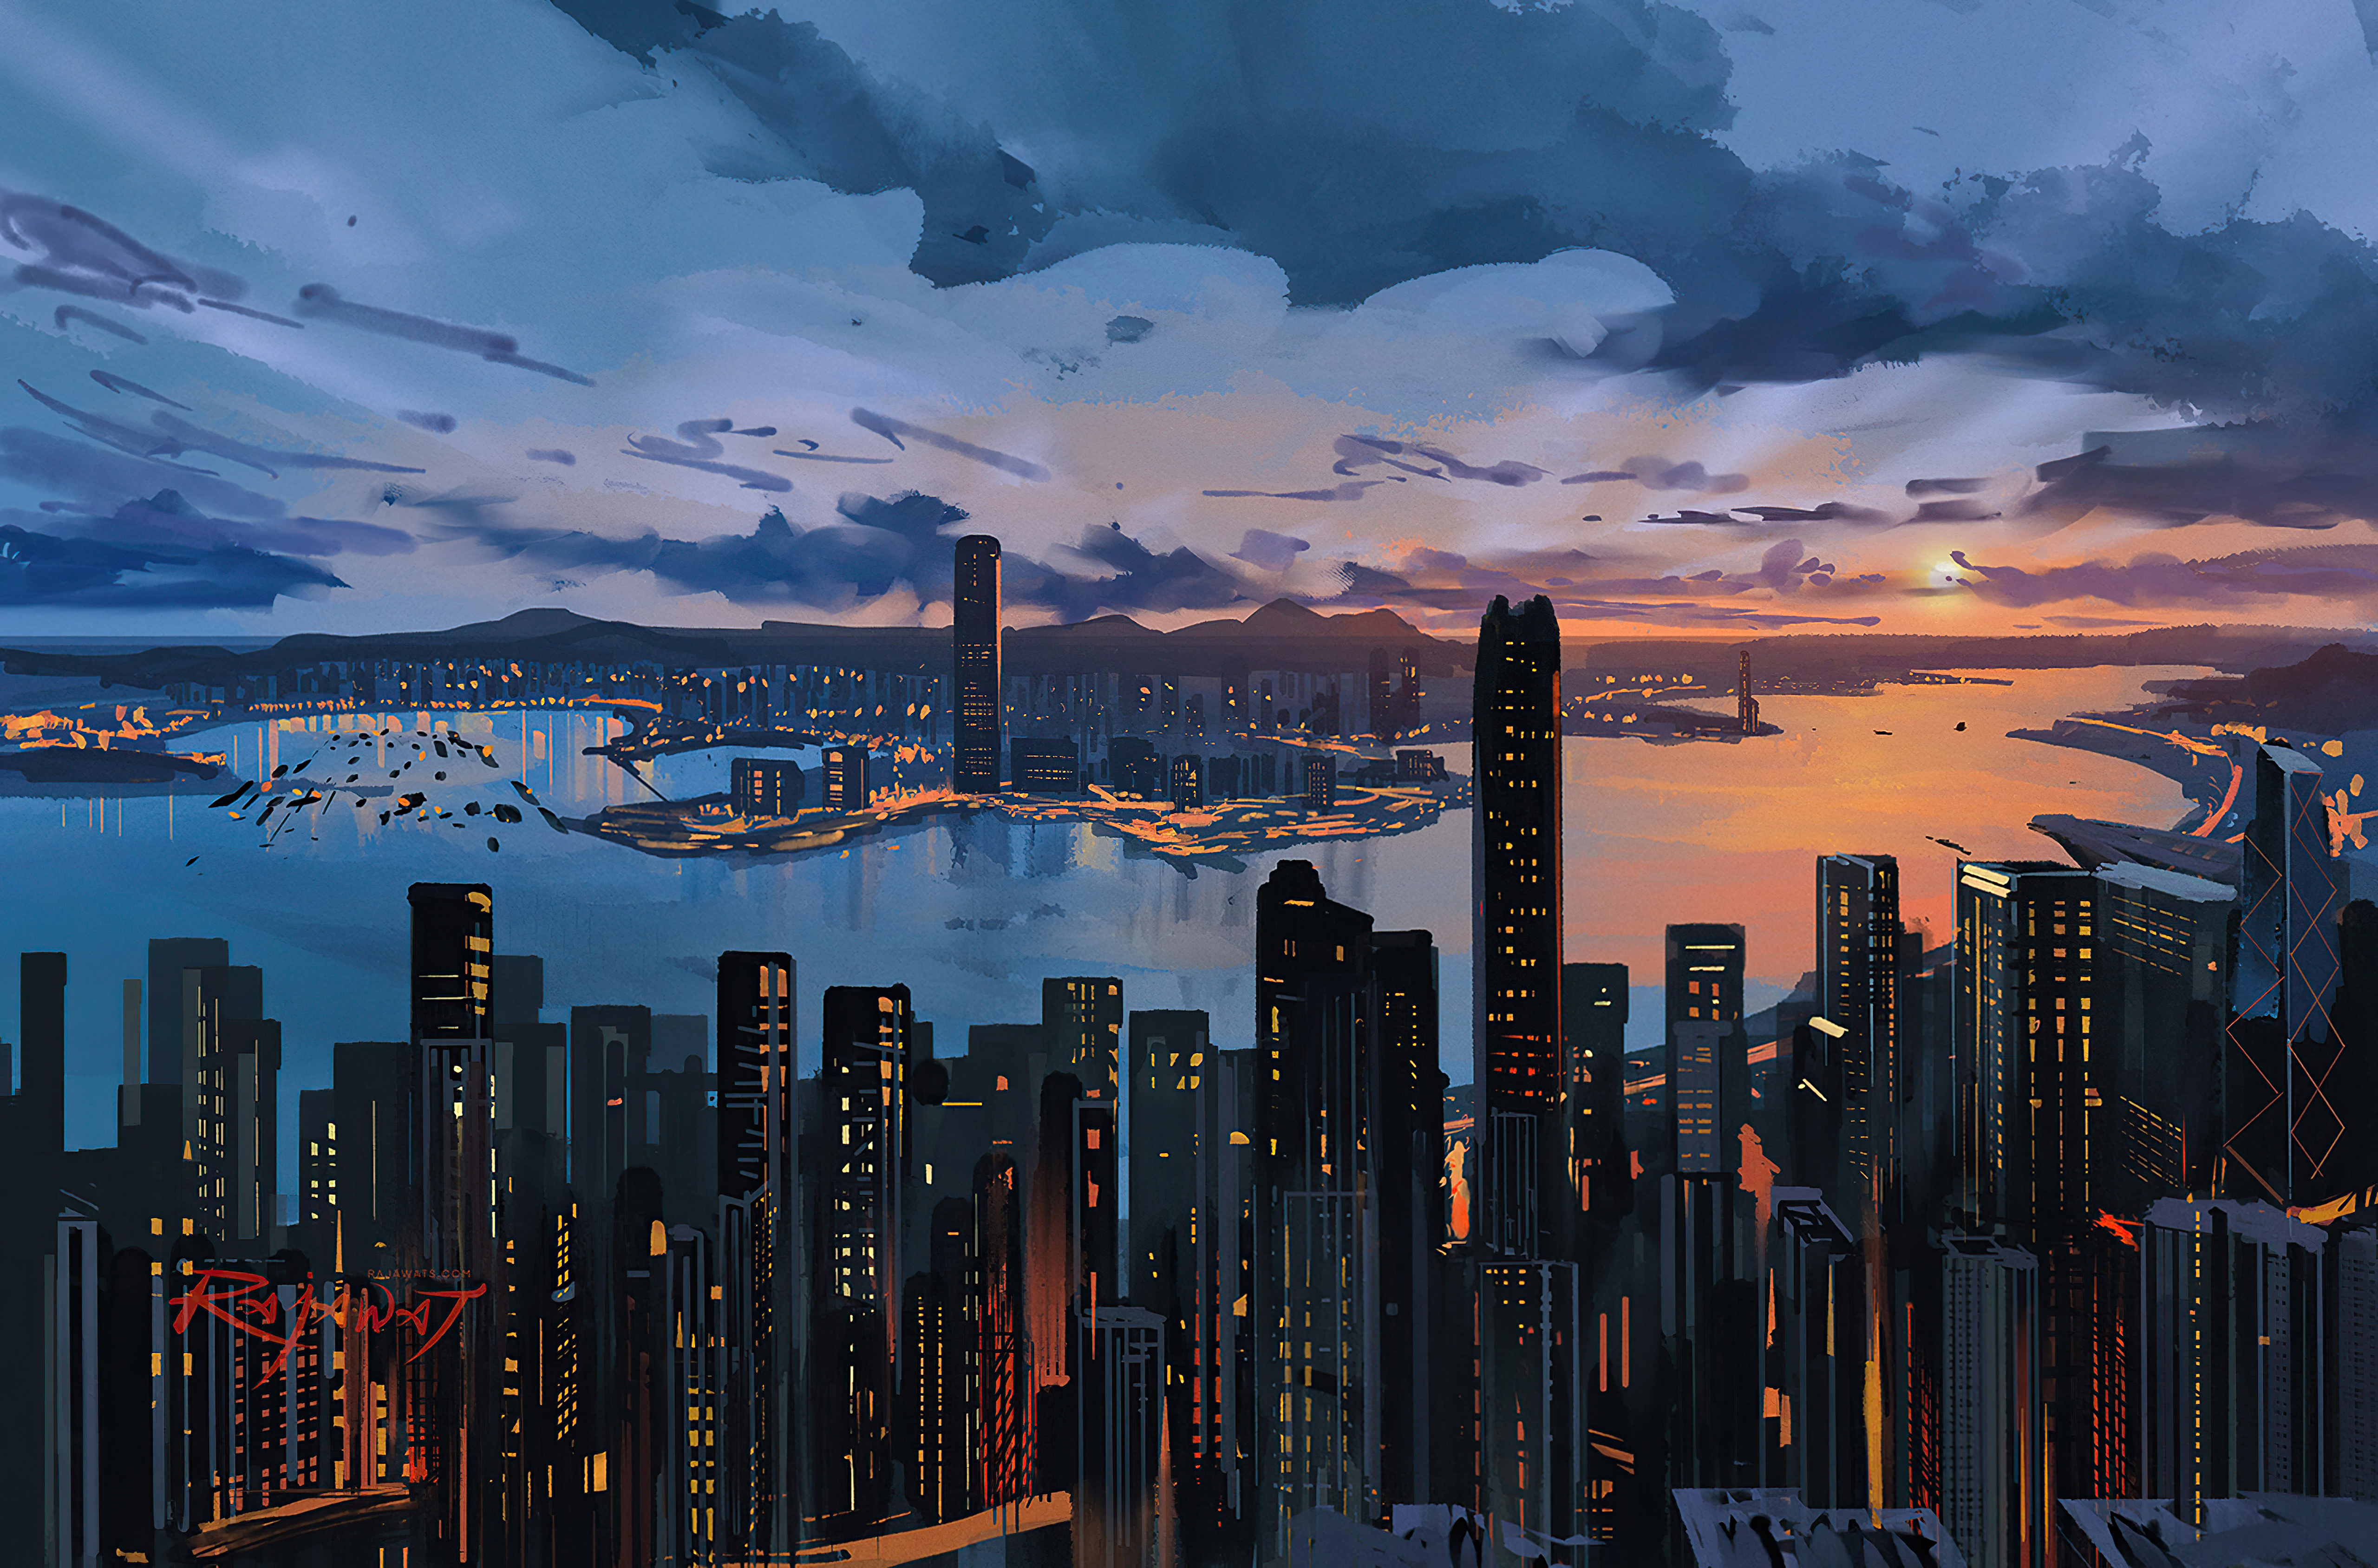 hong kong city pain art 4k 1618131998 - Hong Kong City Pain Art 4k - Hong Kong City Pain Art 4k wallpapers